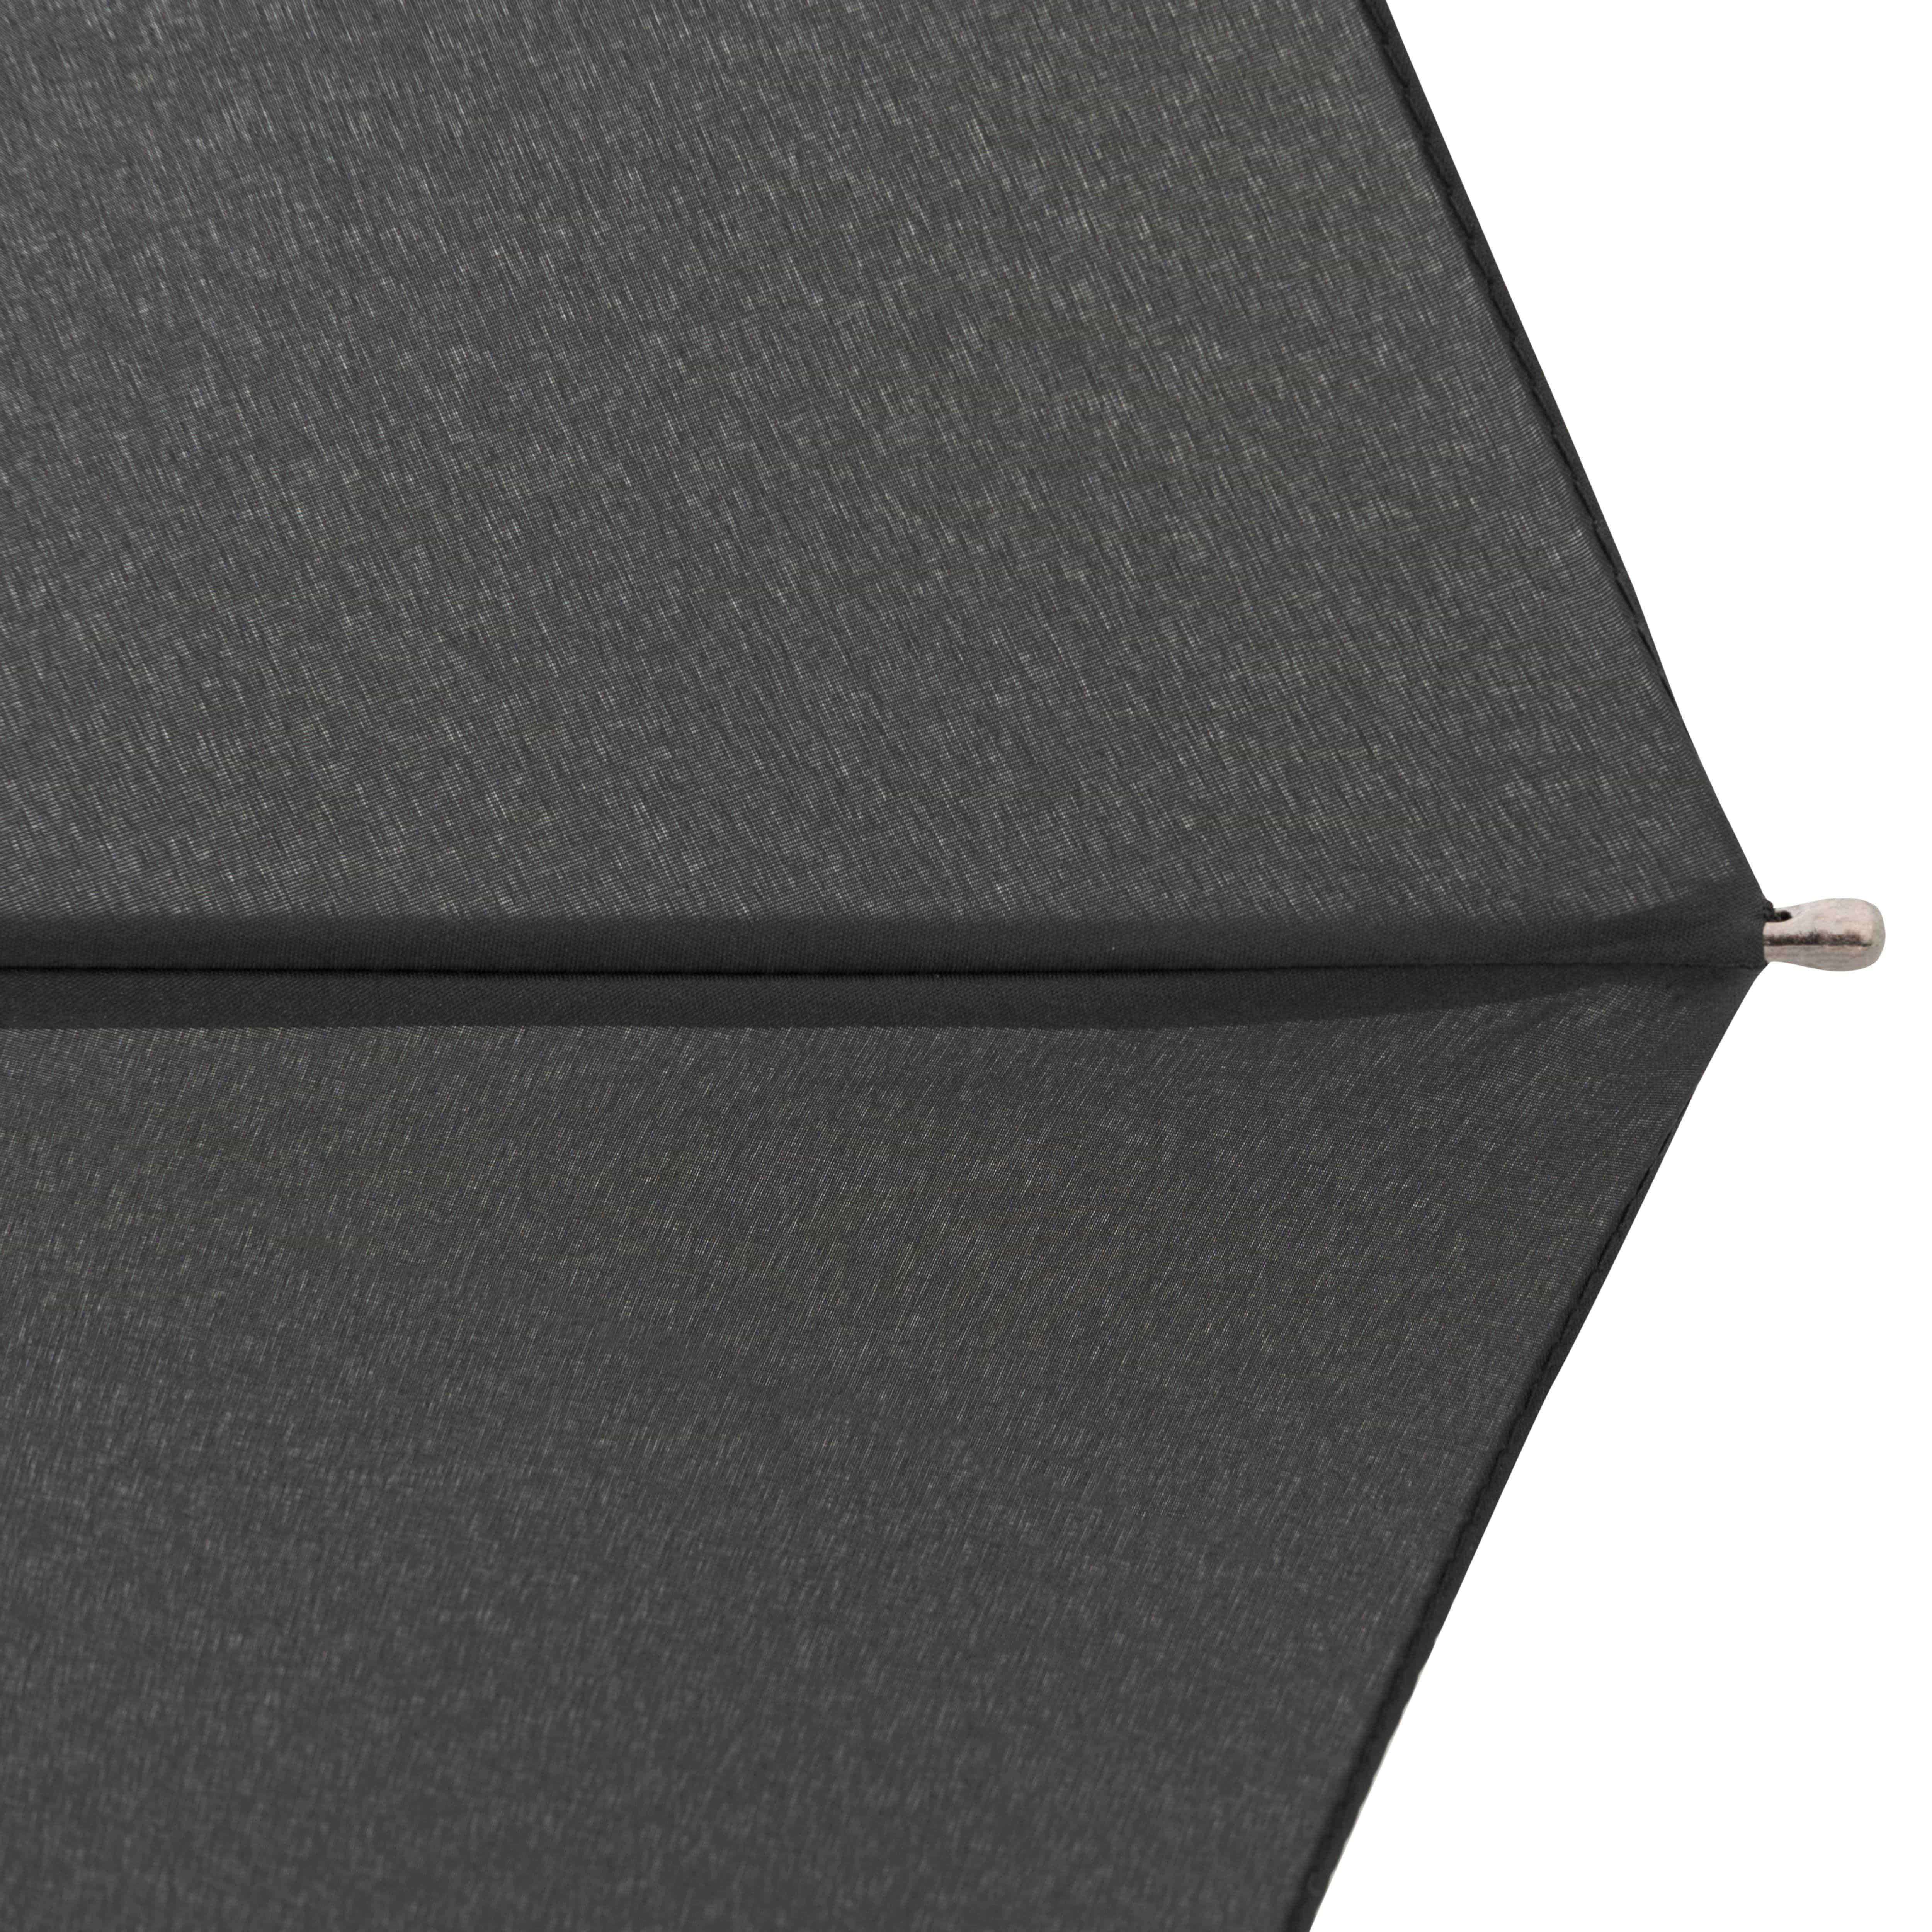 Knirps Umbrella U.090 Ultra Light XXL Manual Compact - foto 4